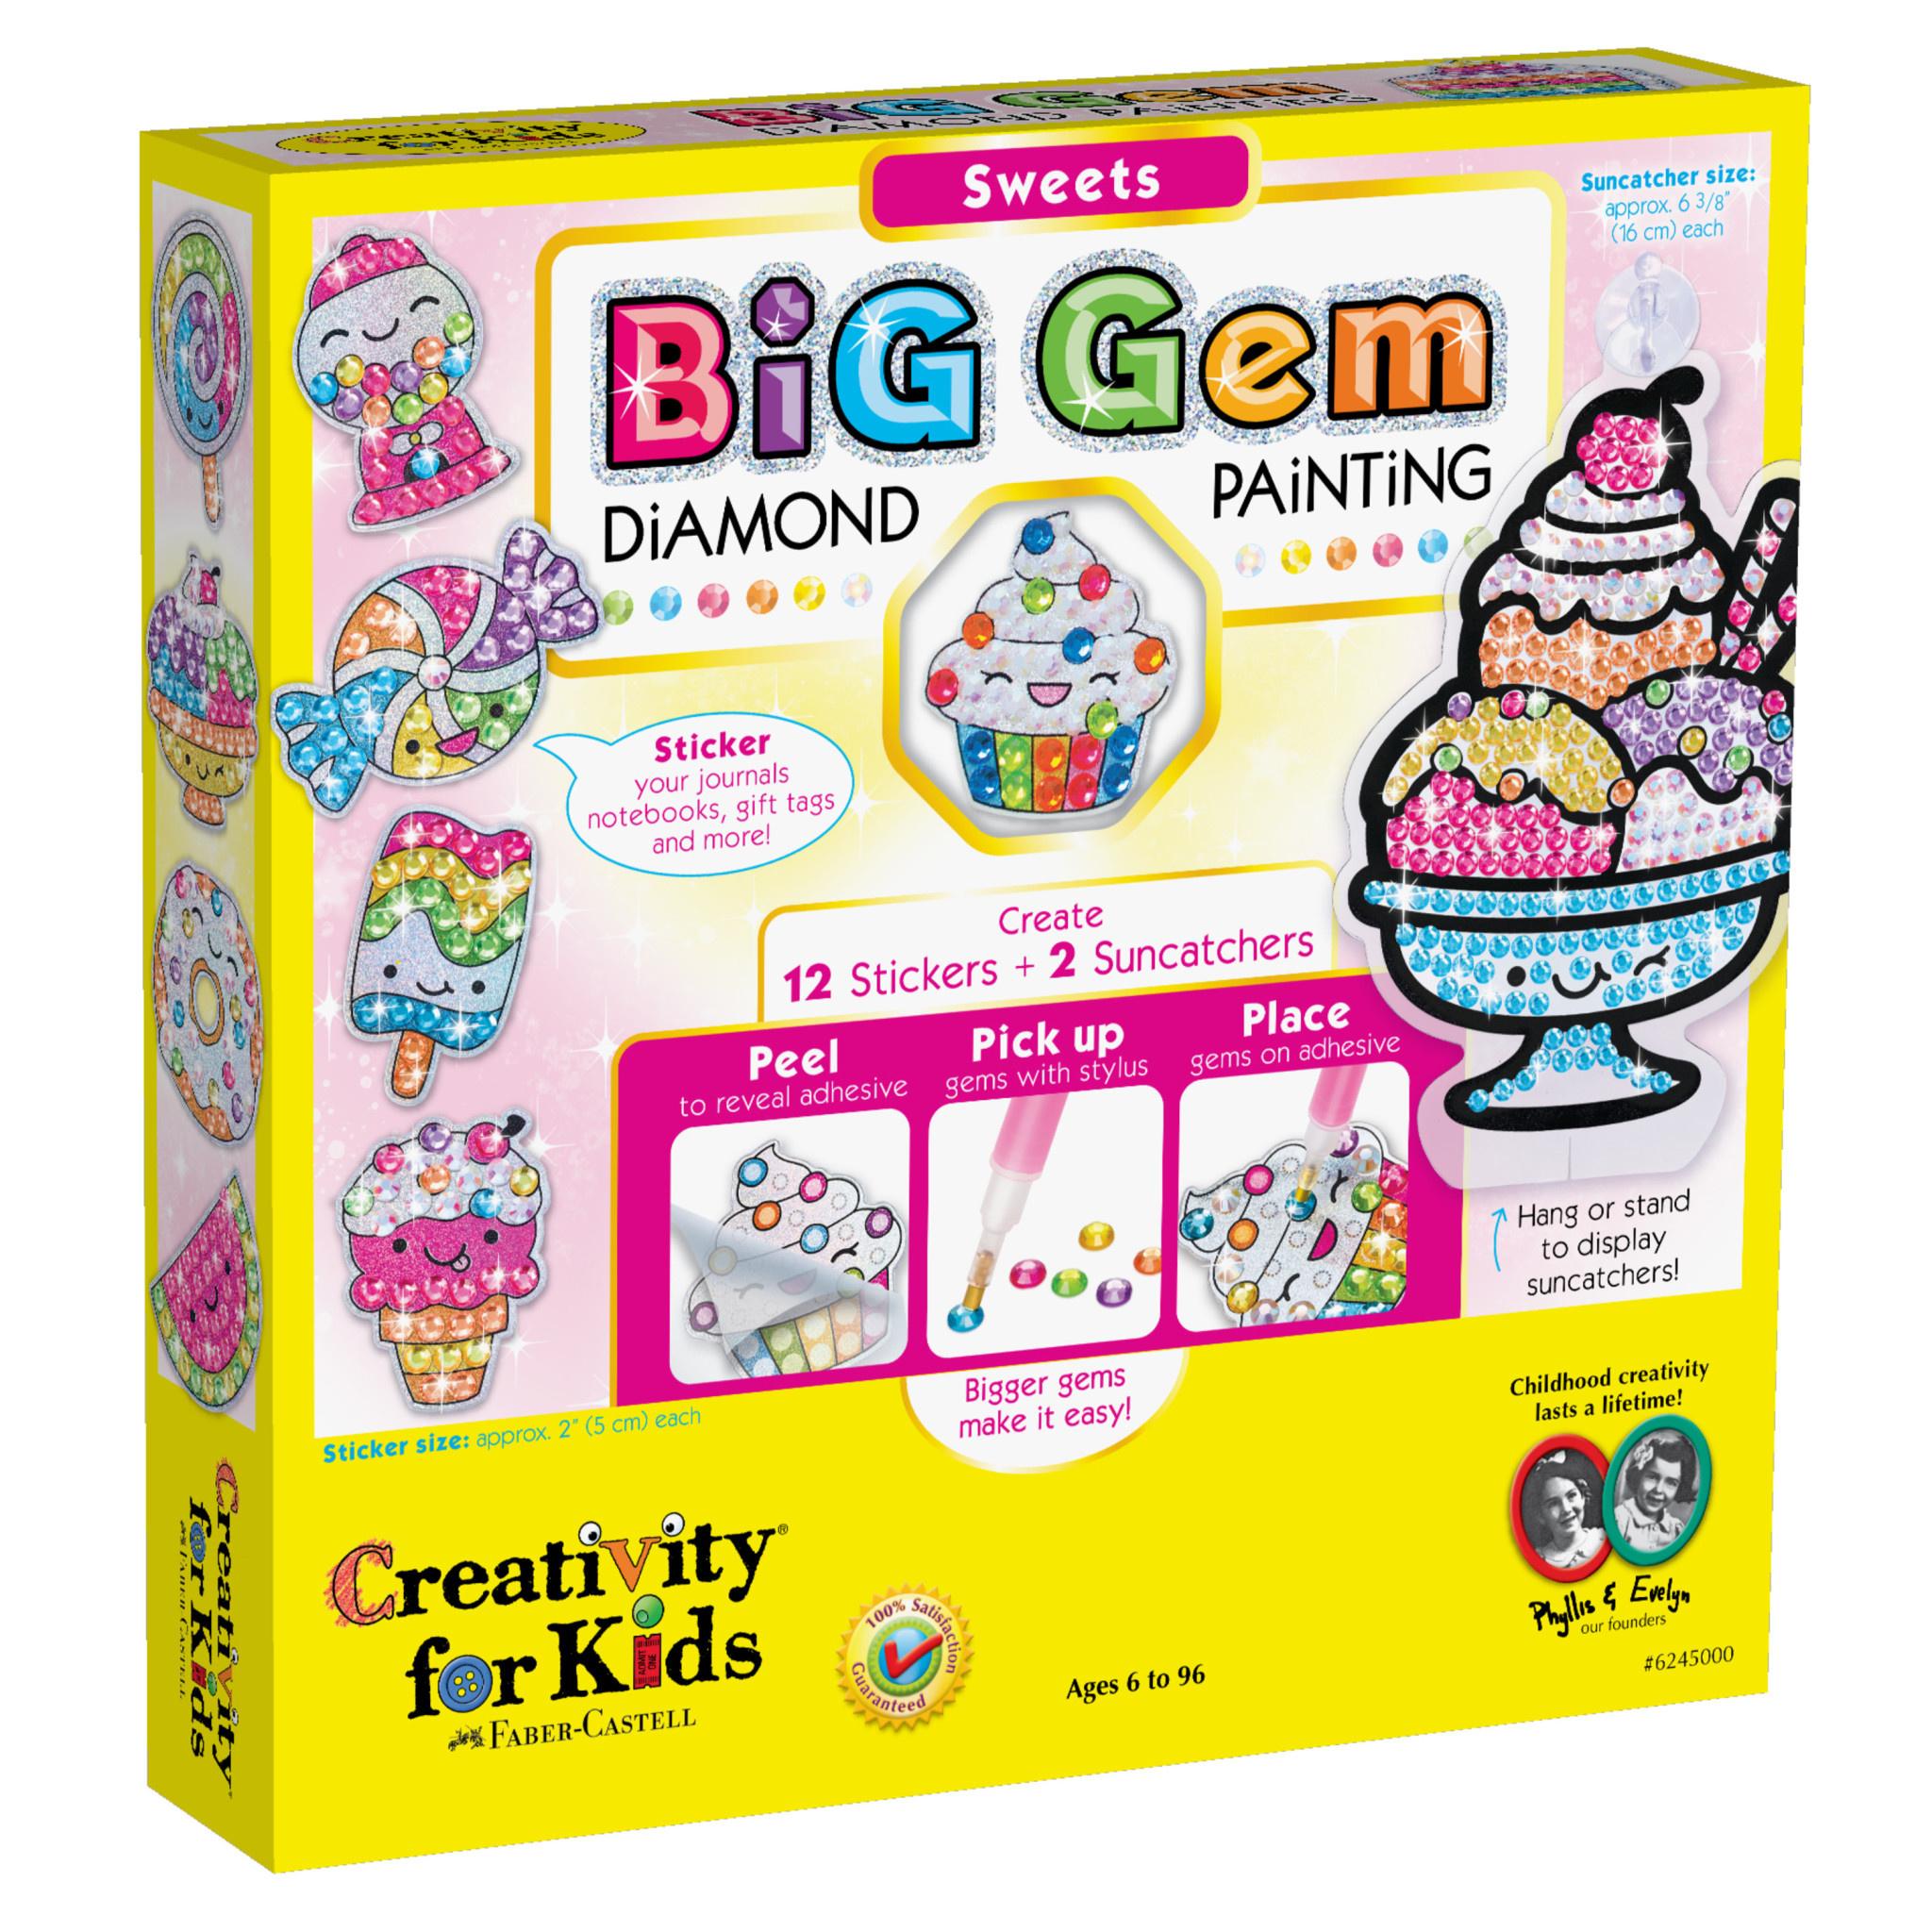 Big Gem Sweets Diamond Painting Kit-2